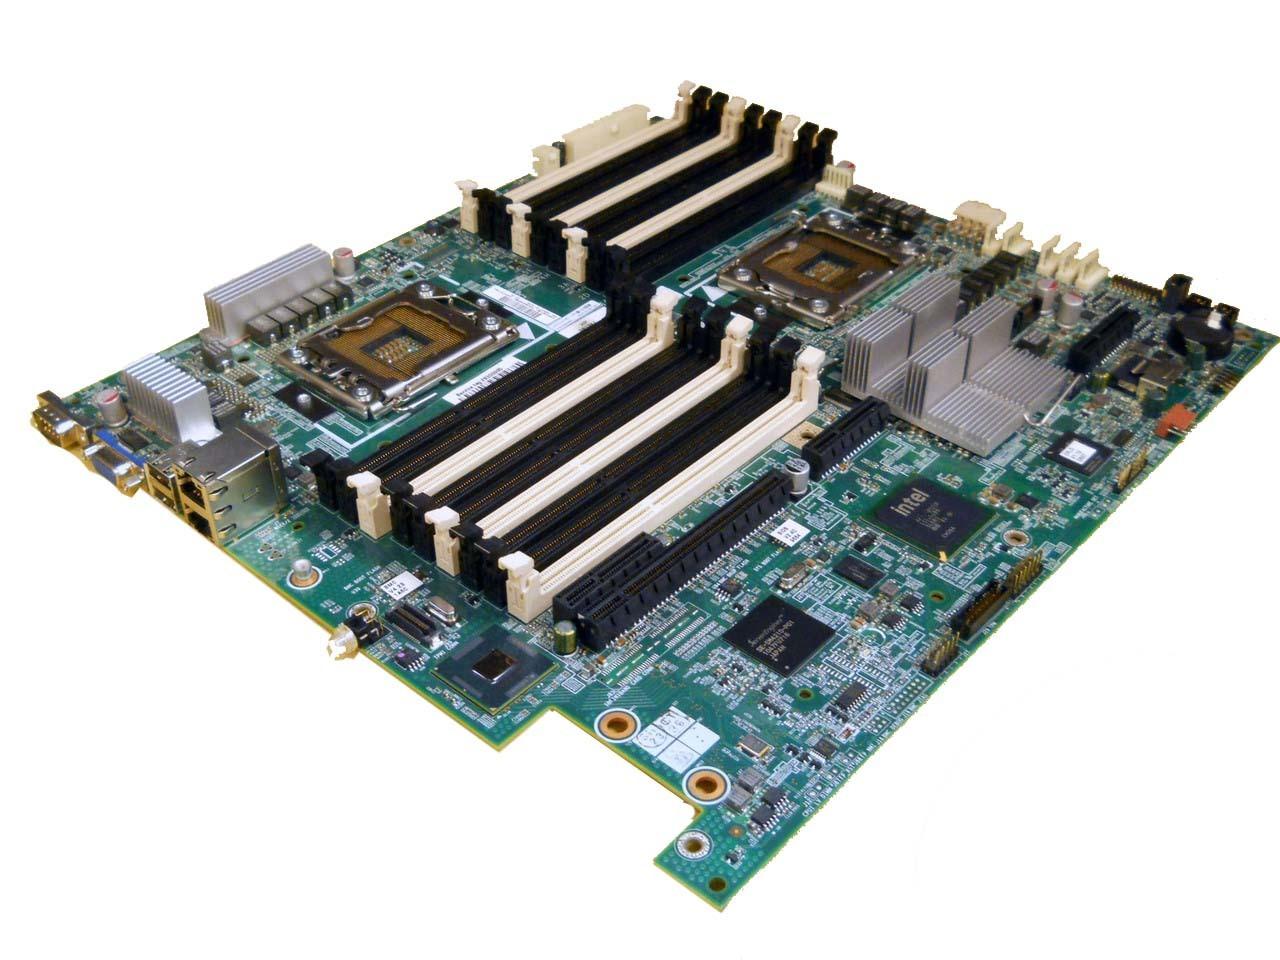 HP Proliant DL160 System Boards